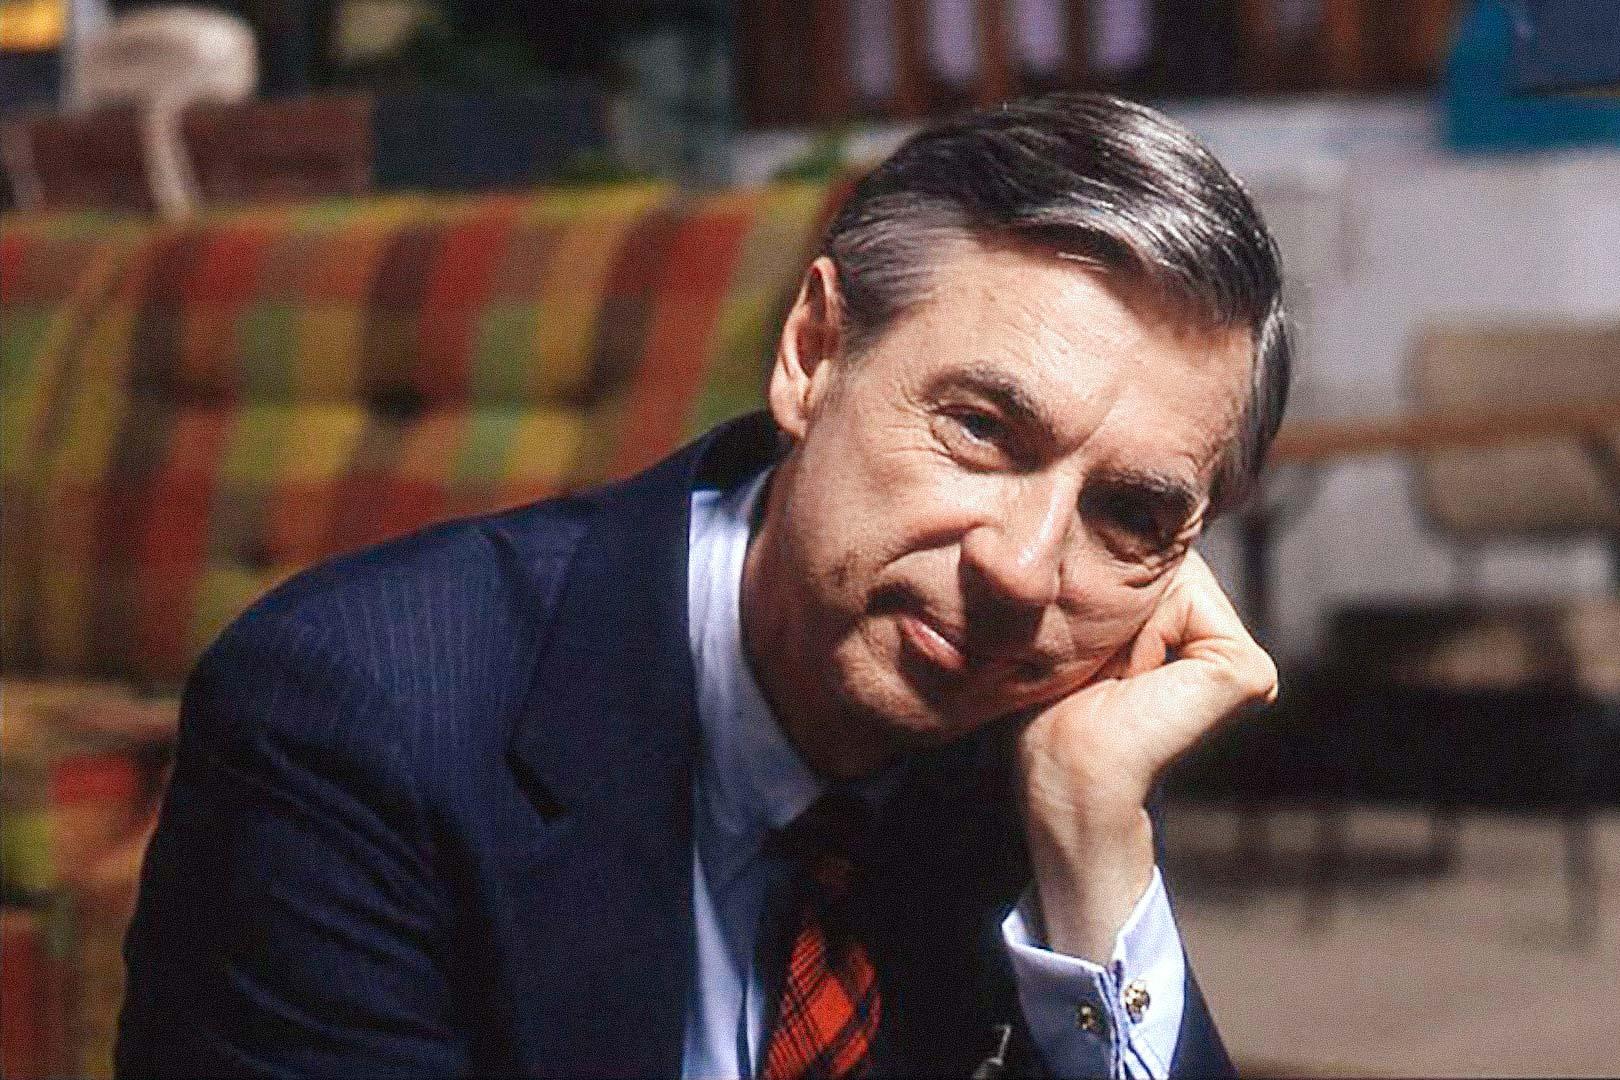 Mr. Rogers.